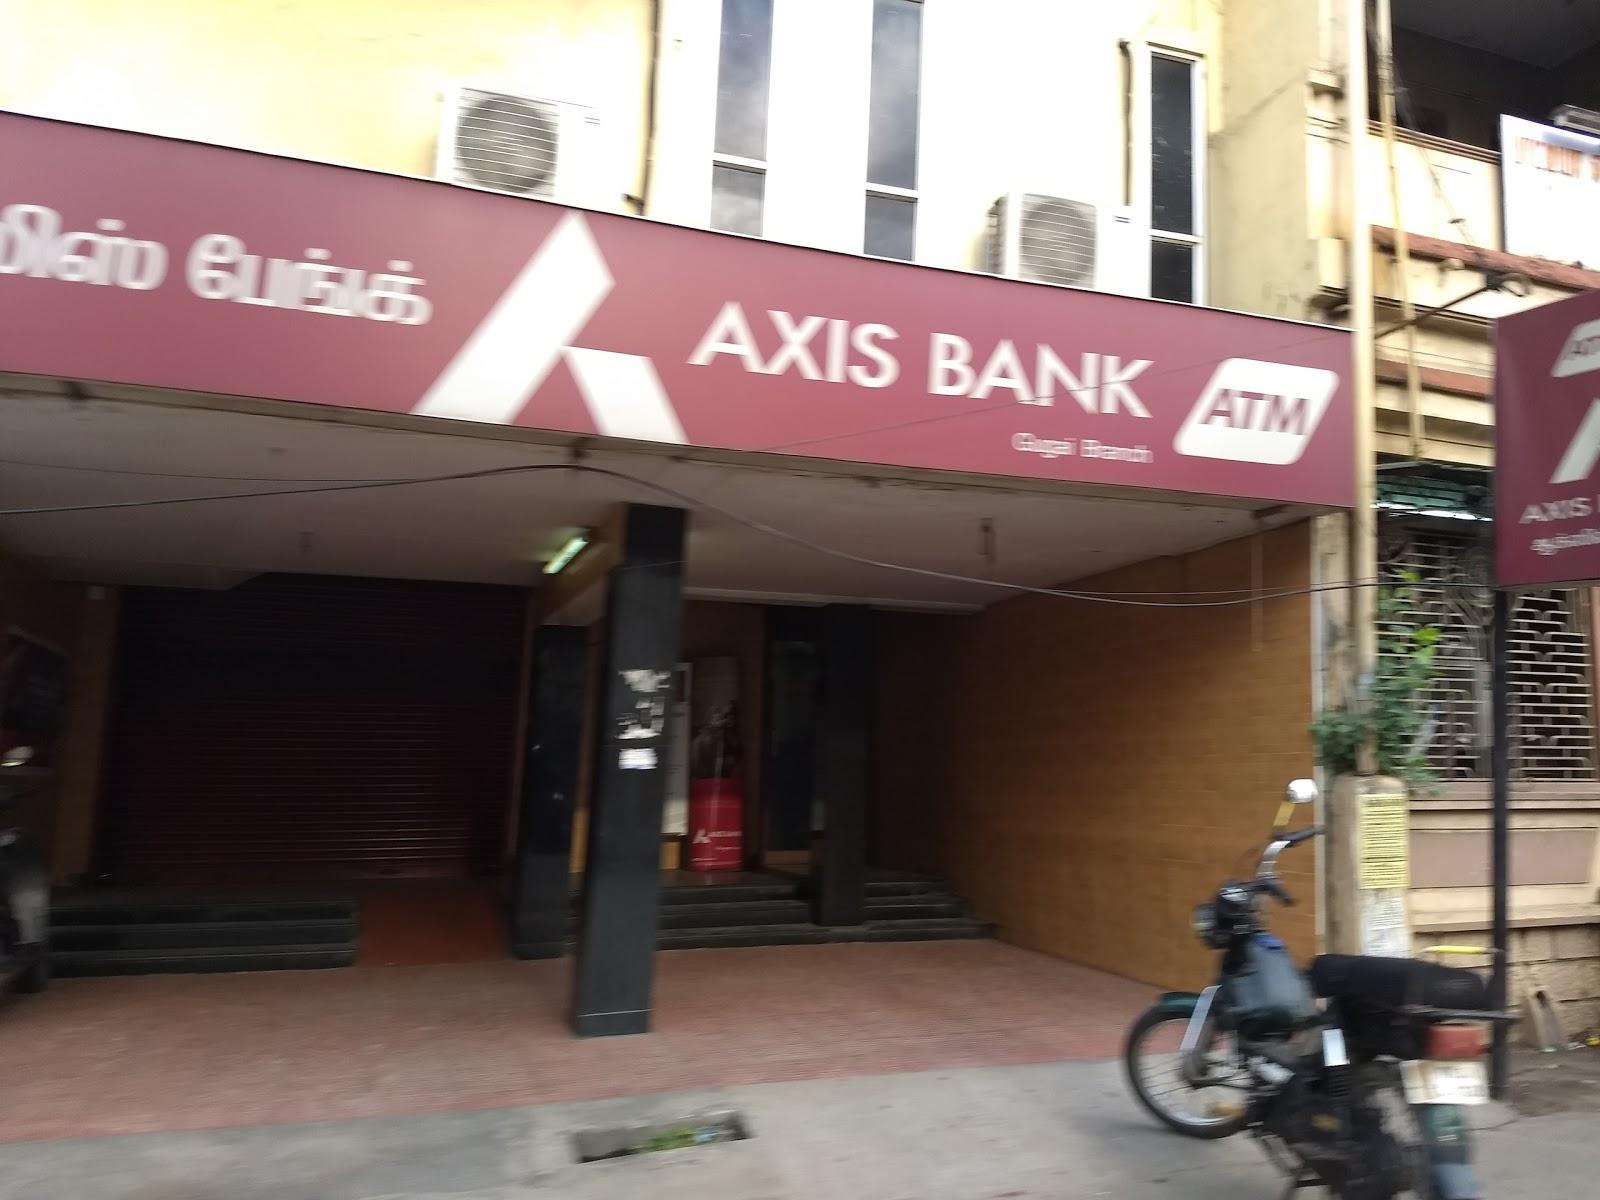 blood bank Axis Bank near Vellore Tamil Nadu